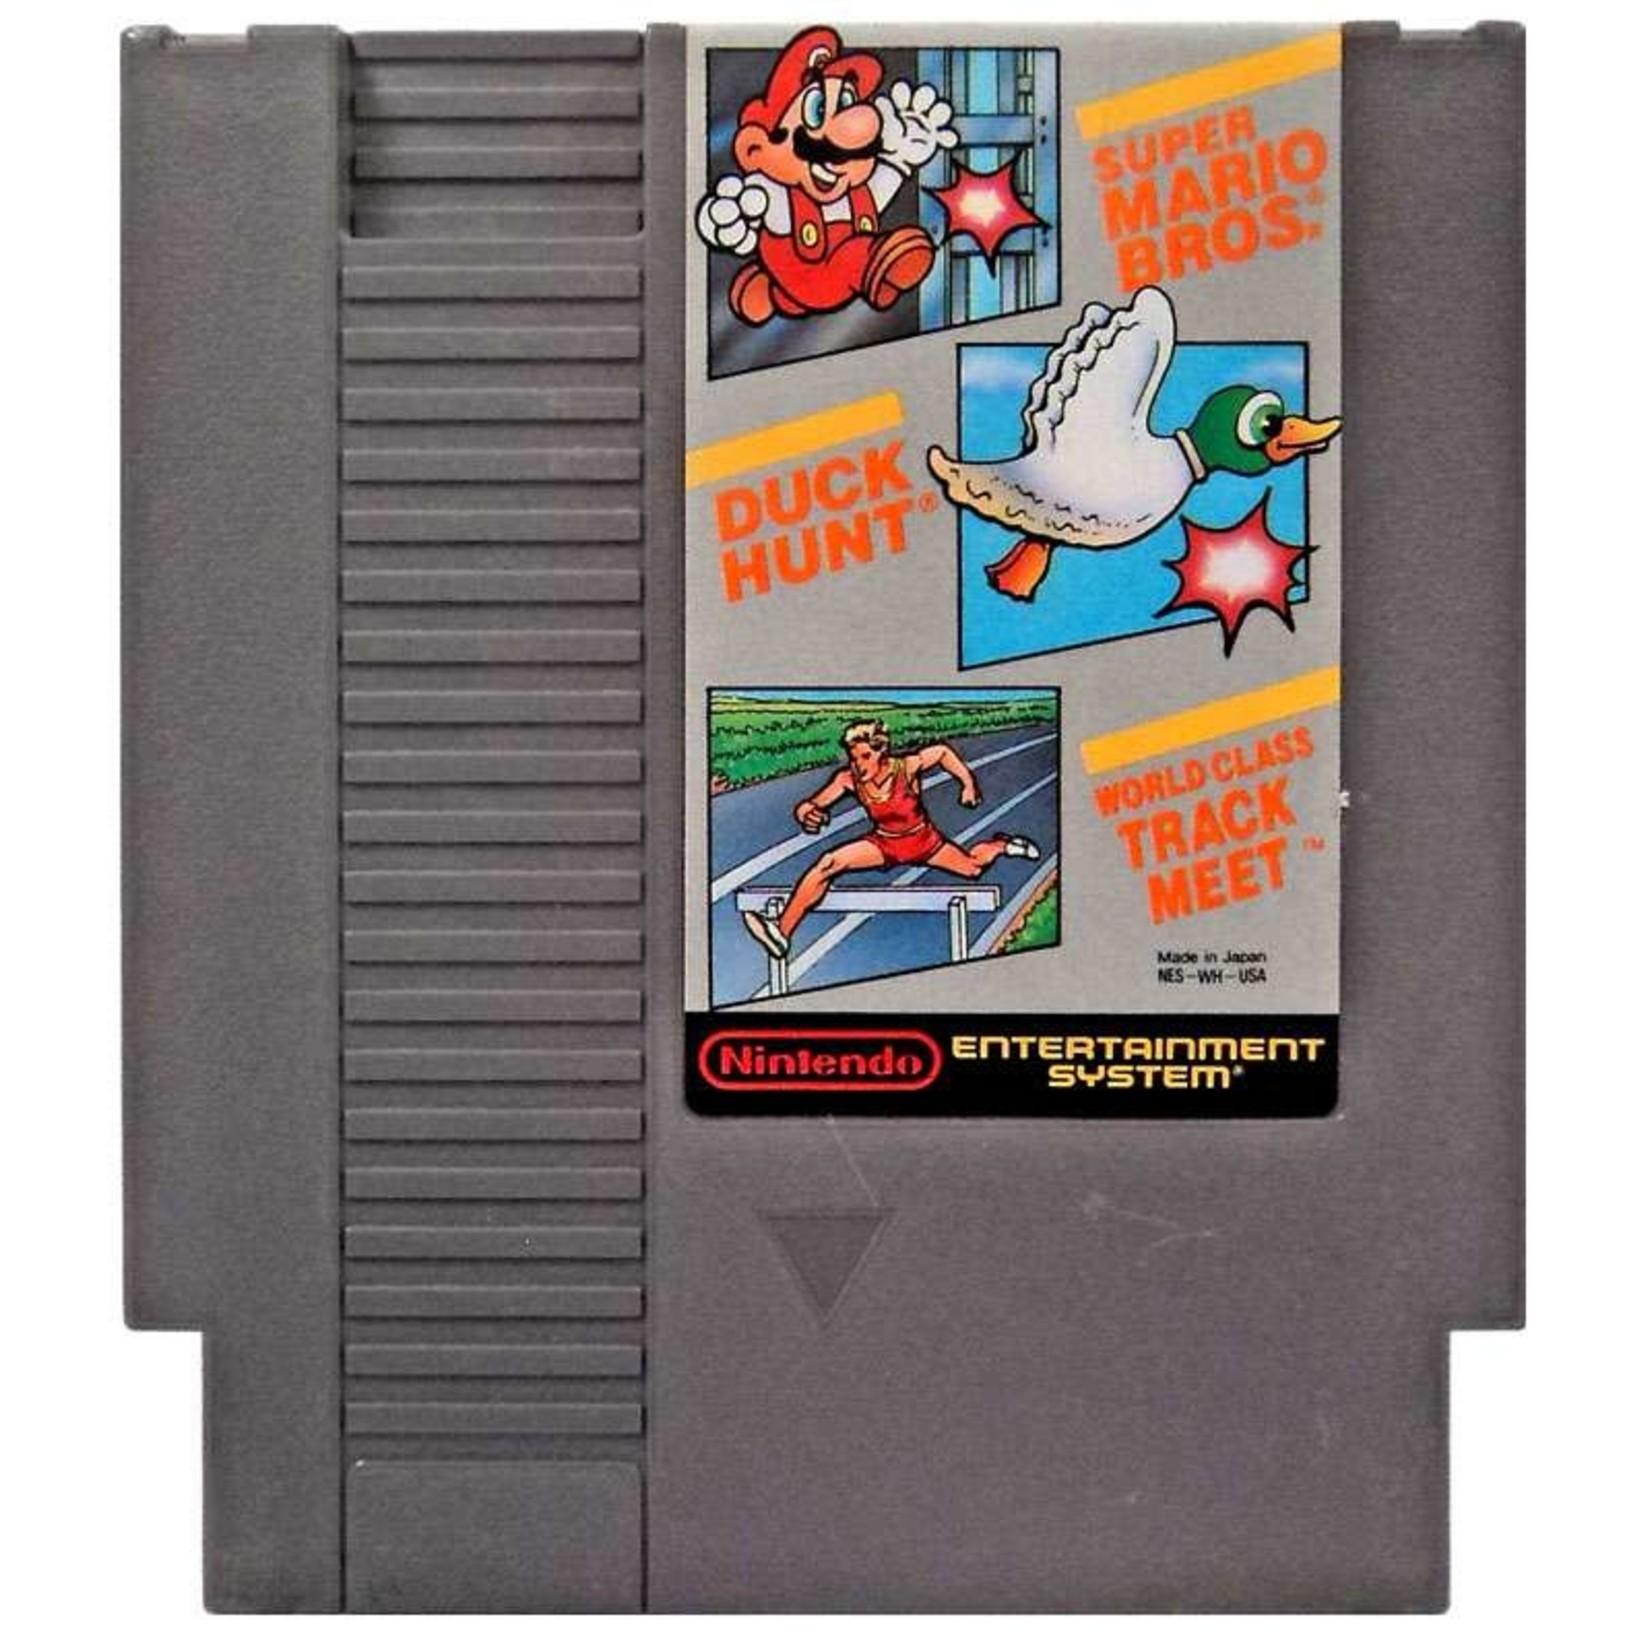 Super Mario Bros Duck Hunt World Class Track Meet (NES)